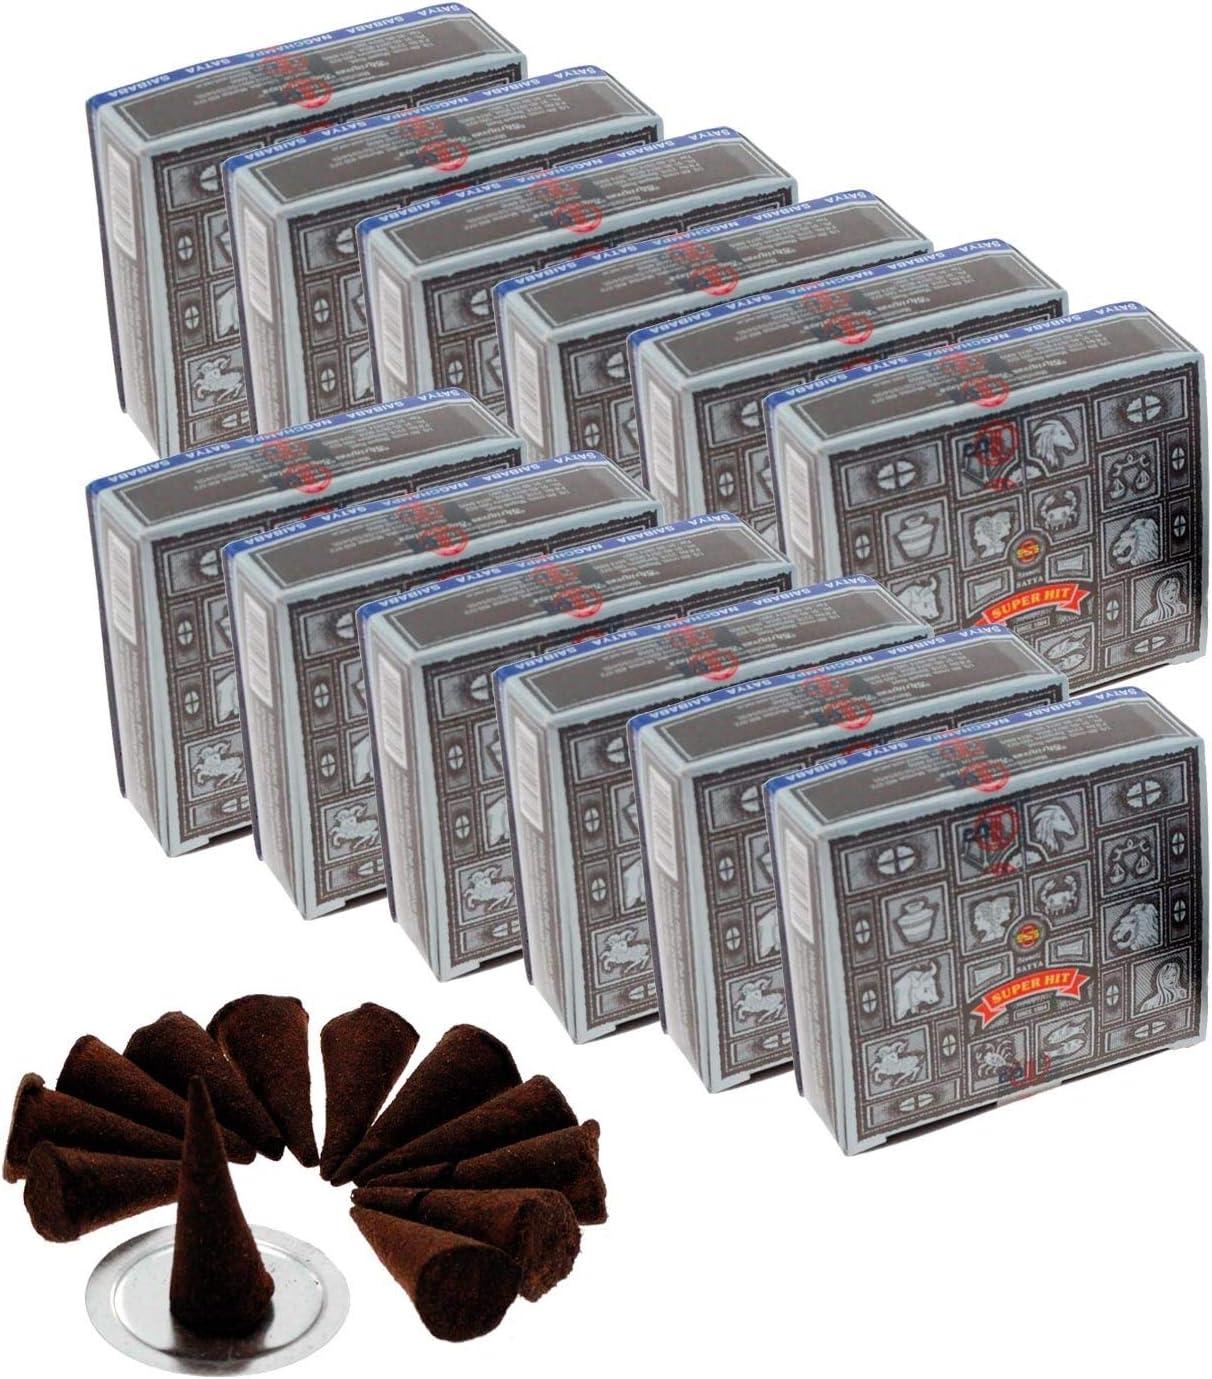 Nag Champa Super Hit Incense Cones, 12 packs of 12